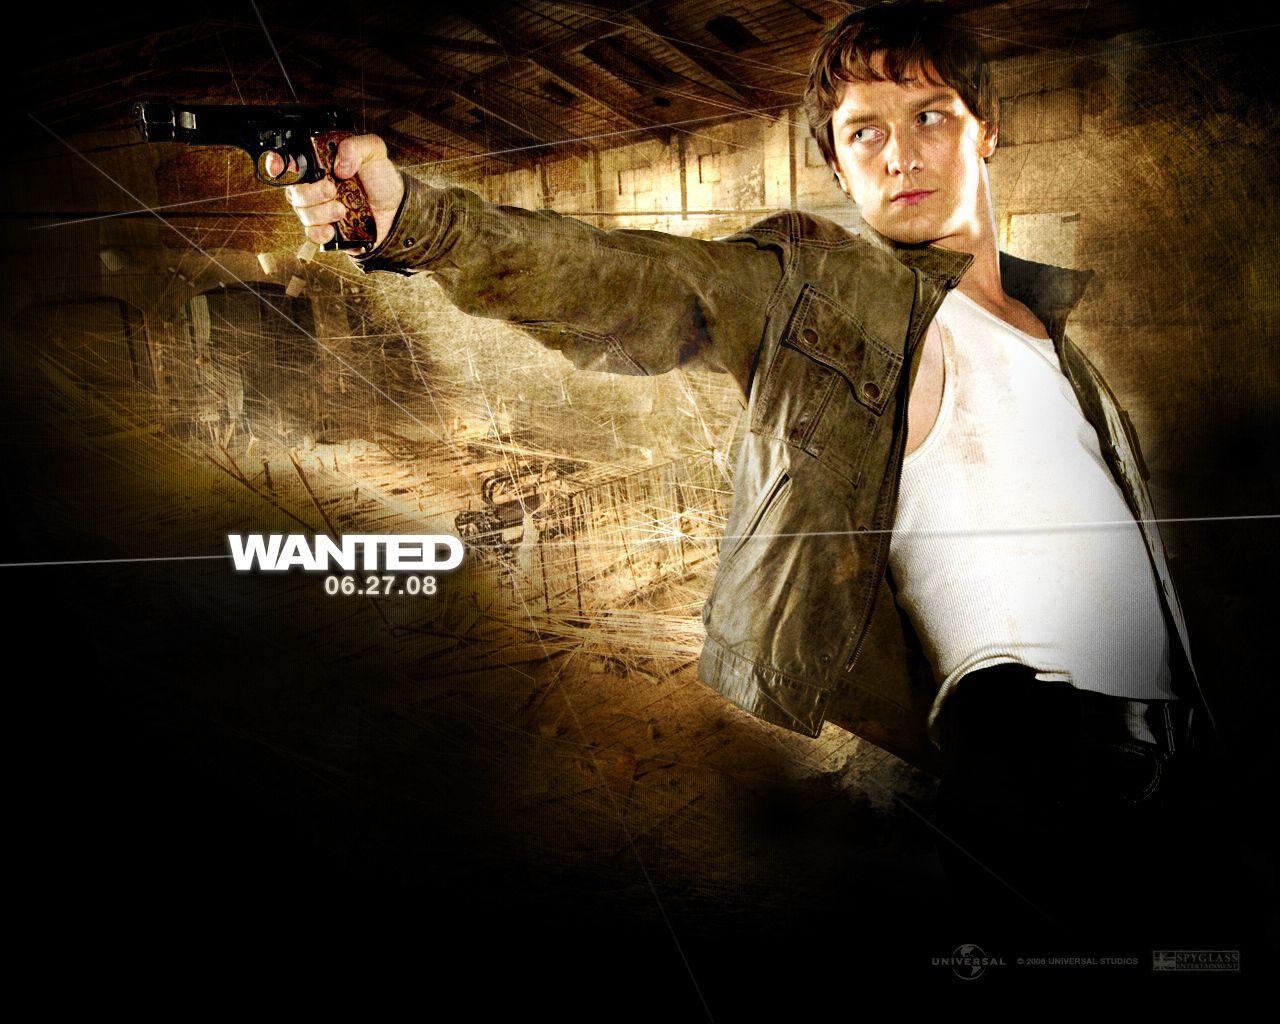 http://4.bp.blogspot.com/-XMUoeWmqAkY/TbDbNA1hTnI/AAAAAAAACVE/OXIbXHFHeMM/s1600/Wanted-james-mcavoy.jpg